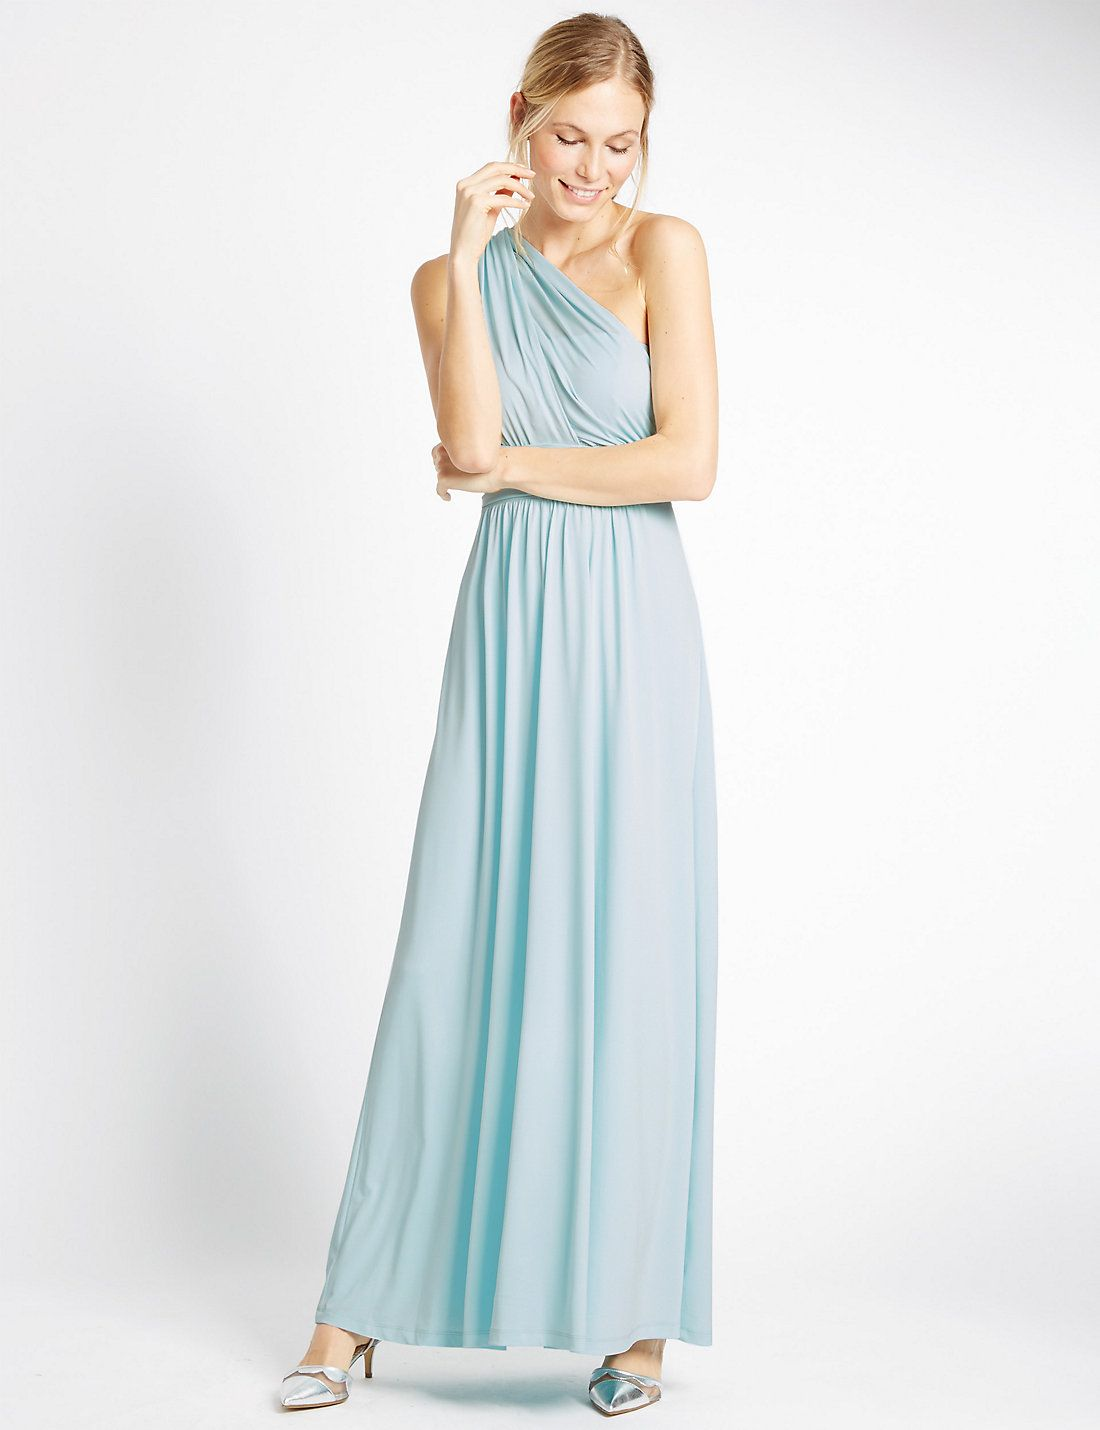 Multiway Strap Maxi Dress in Duck Egg   Bridesmaid Dresses   Pinterest